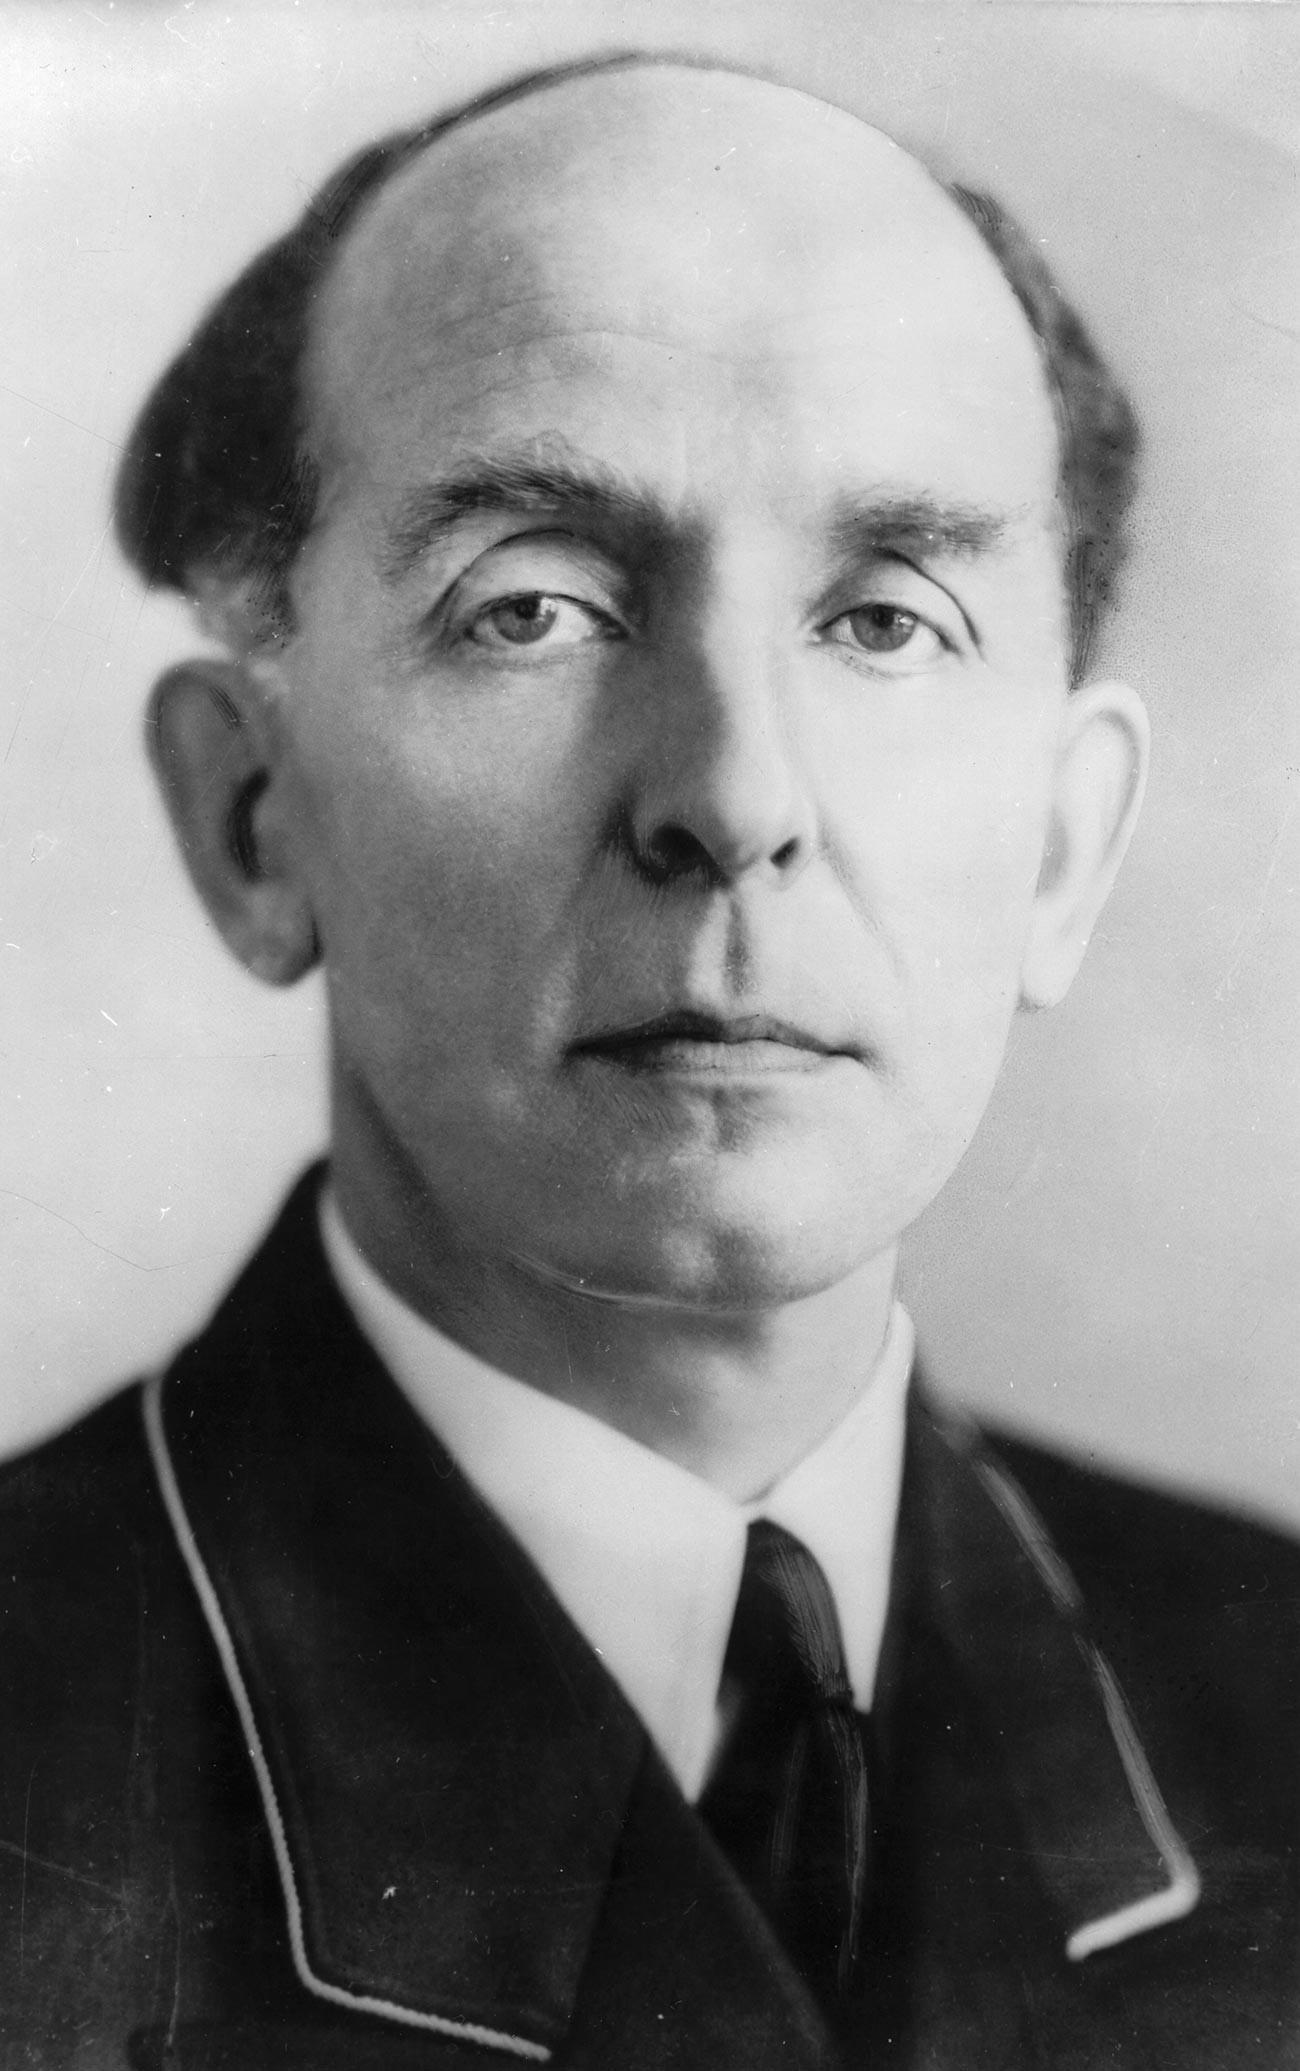 Роланд Фрајслер око 1943